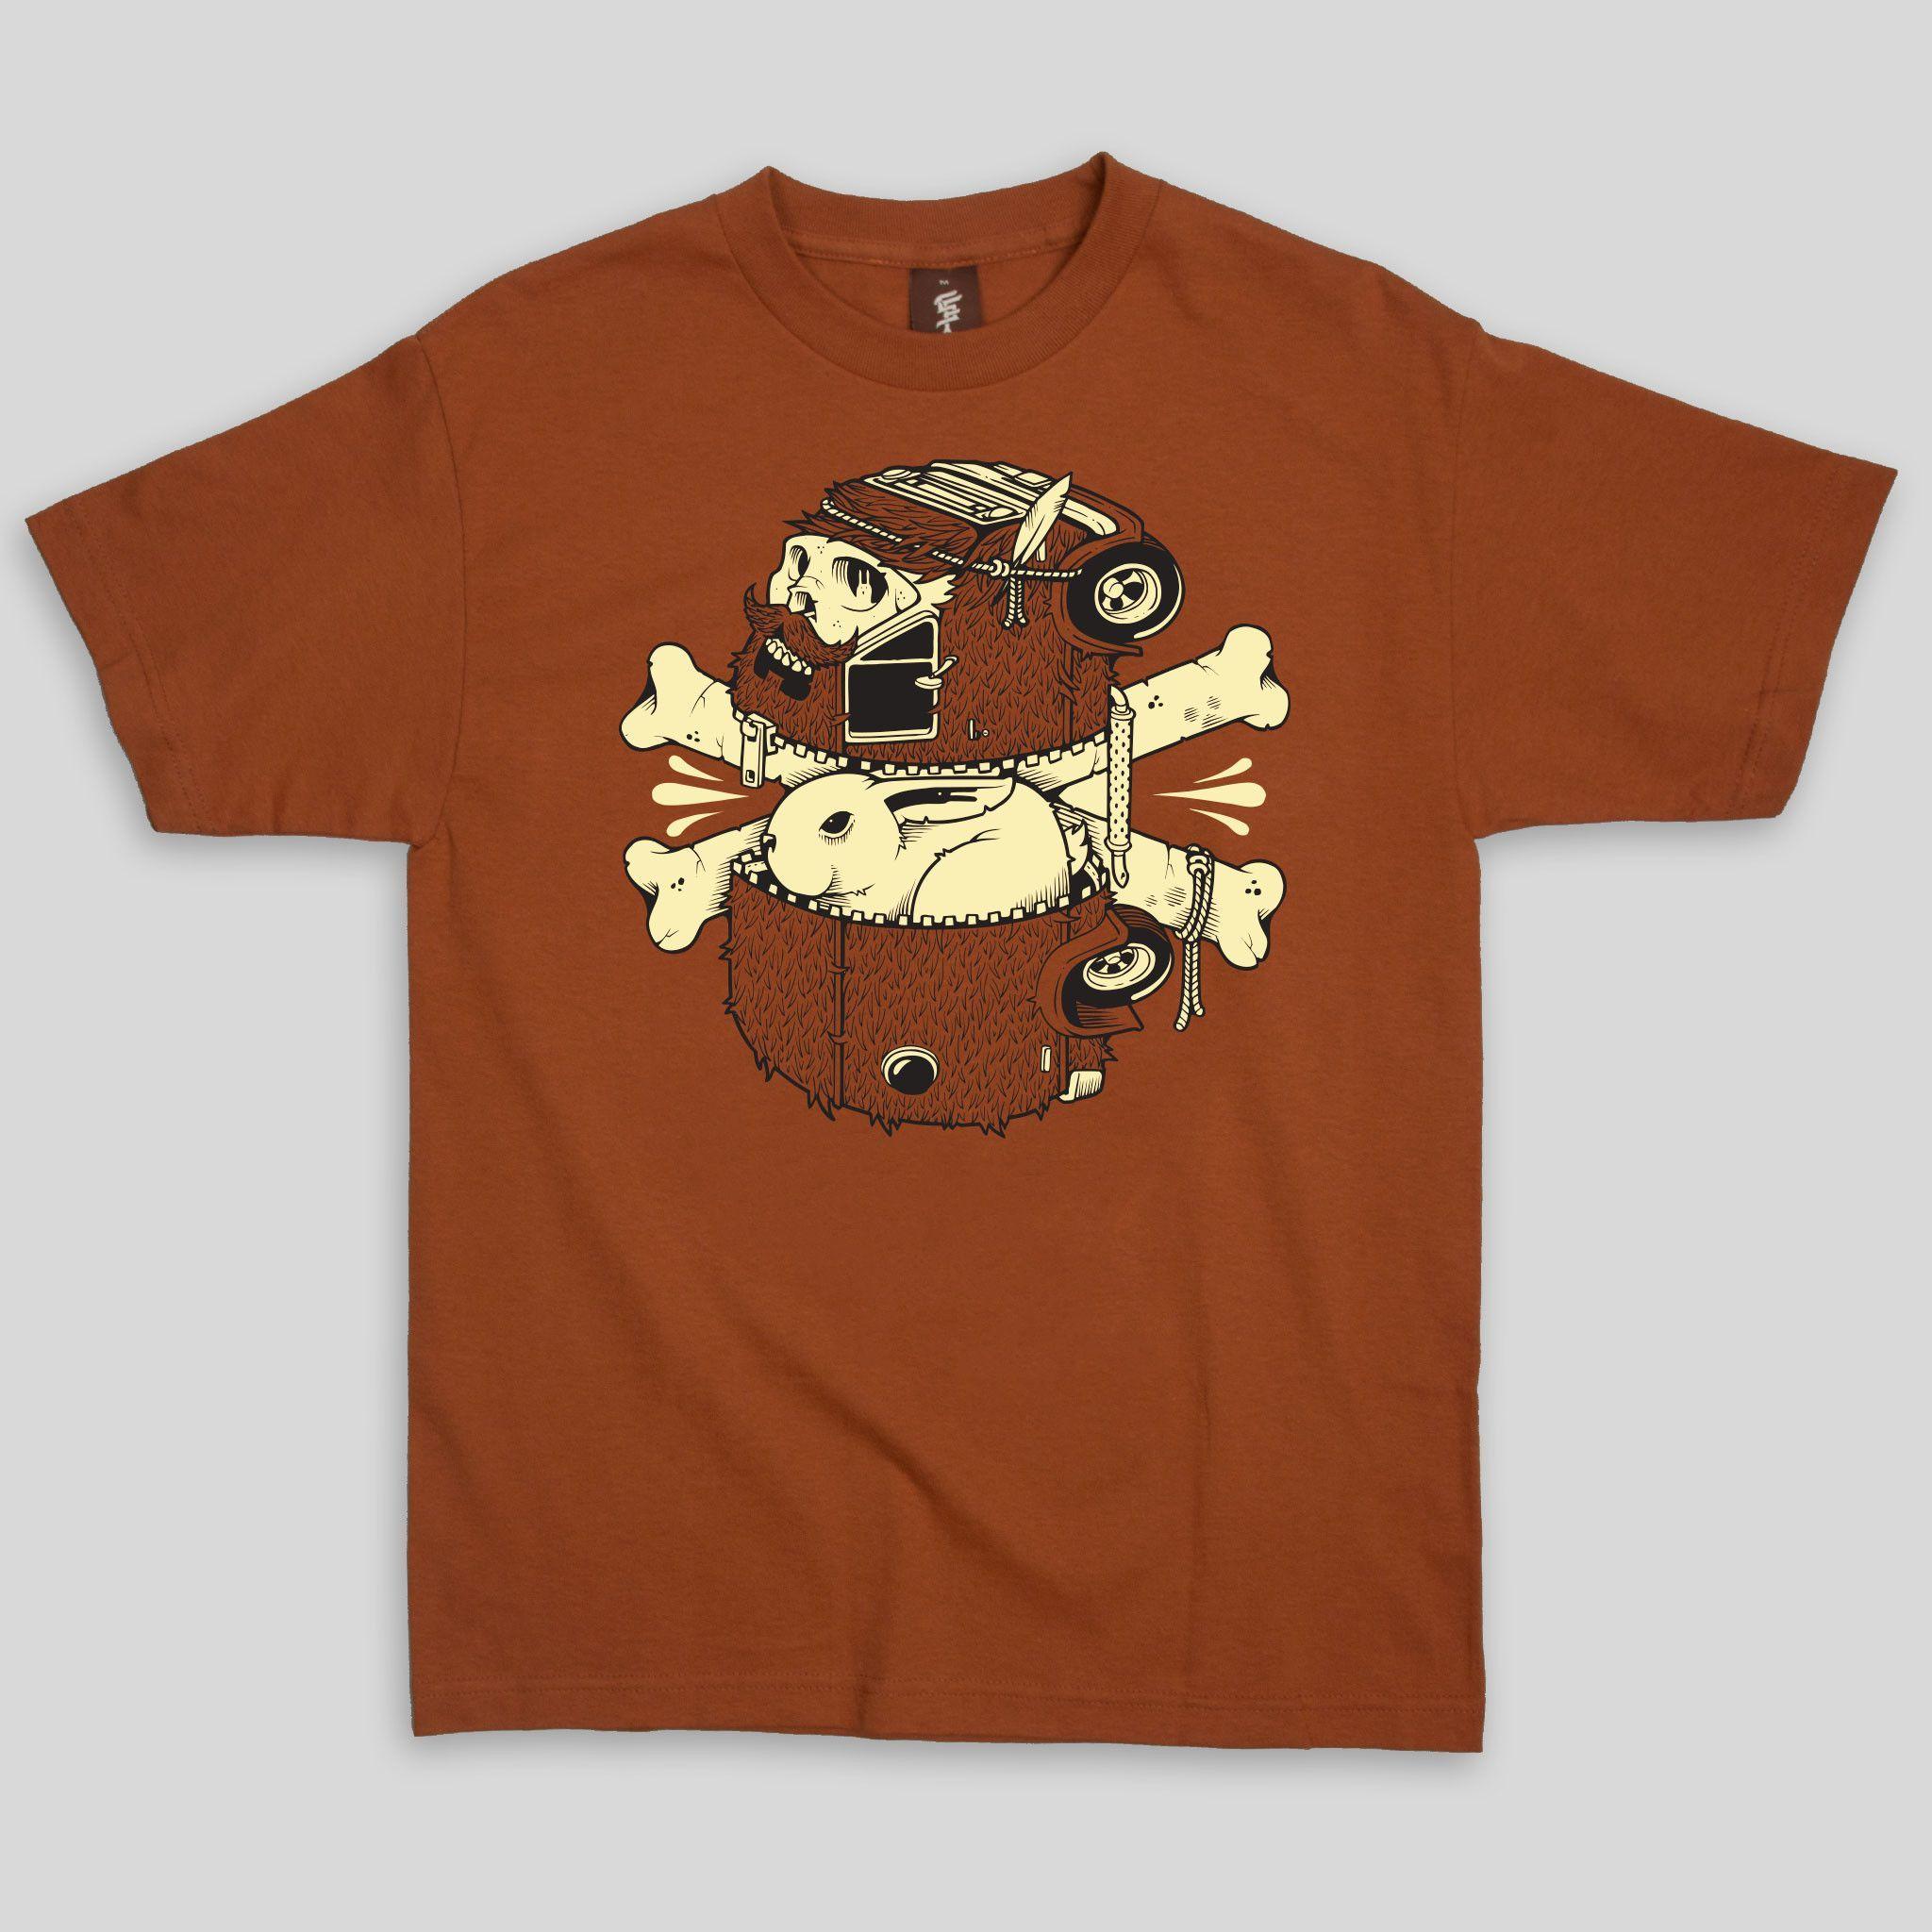 Getaway Beard T-Shirt By Jeremy Fish